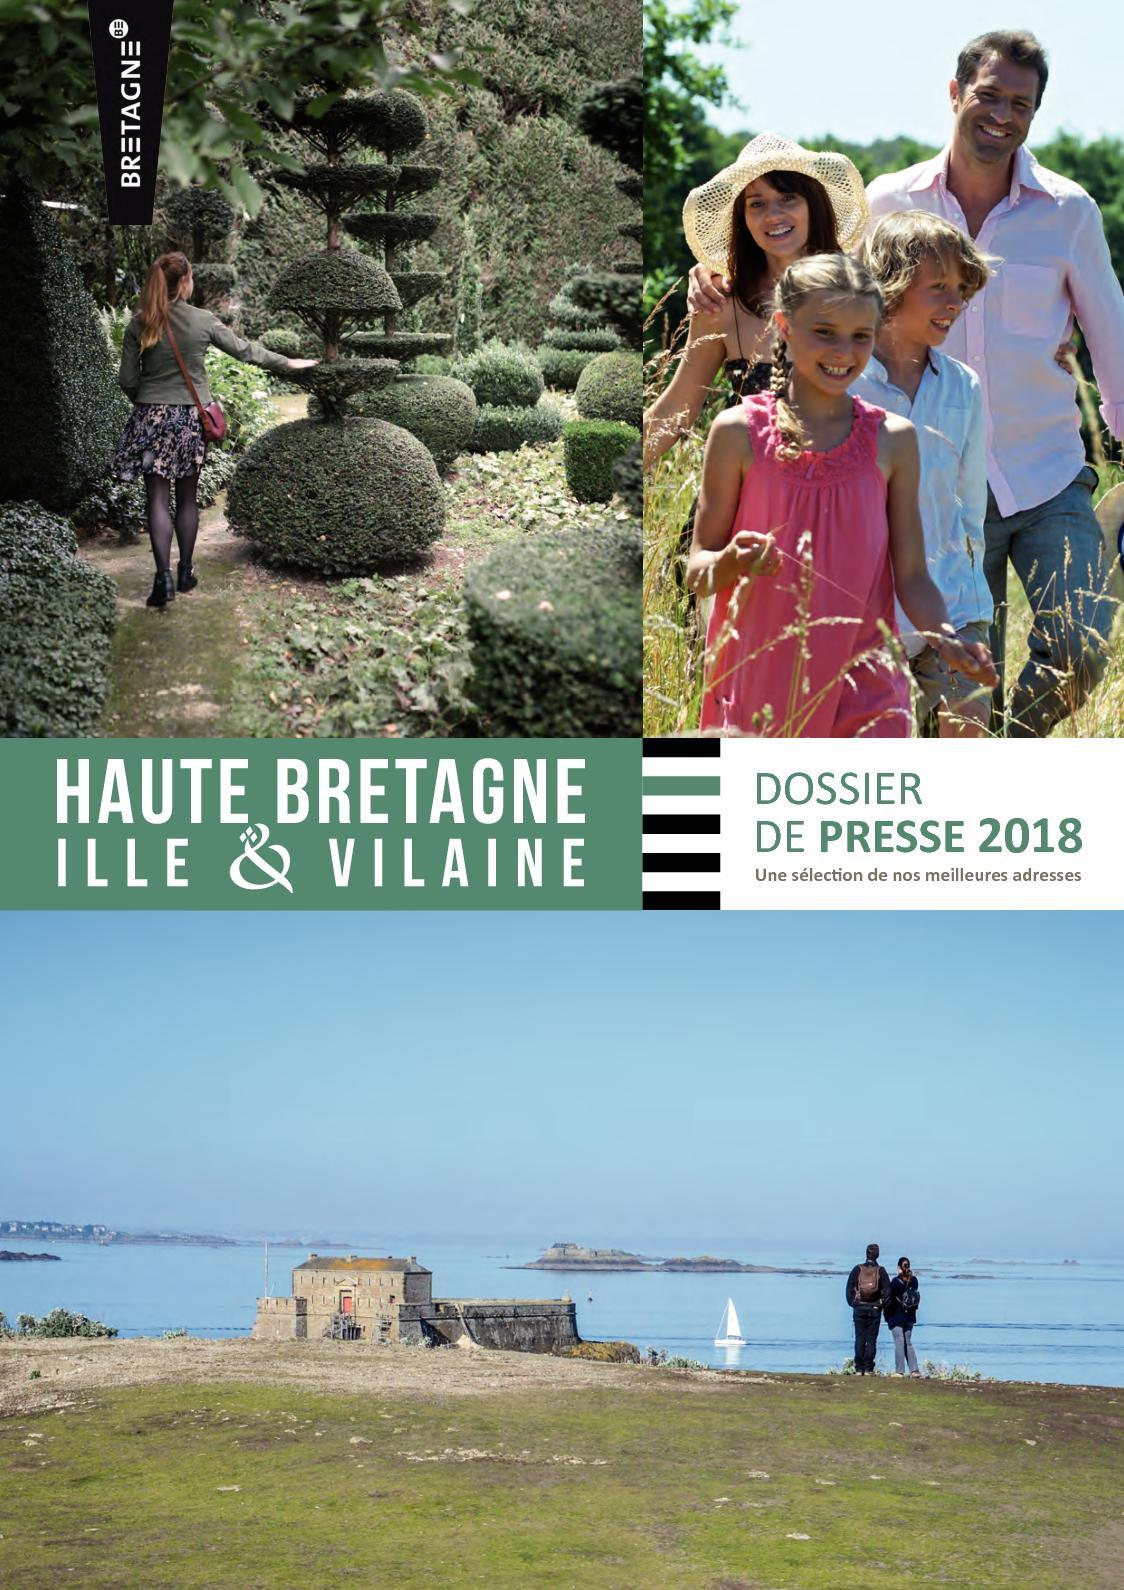 Agapanthe Jardin Génial Calaméo Dossier De Presse 2018 Haute Bretagne Of 84 Génial Agapanthe Jardin